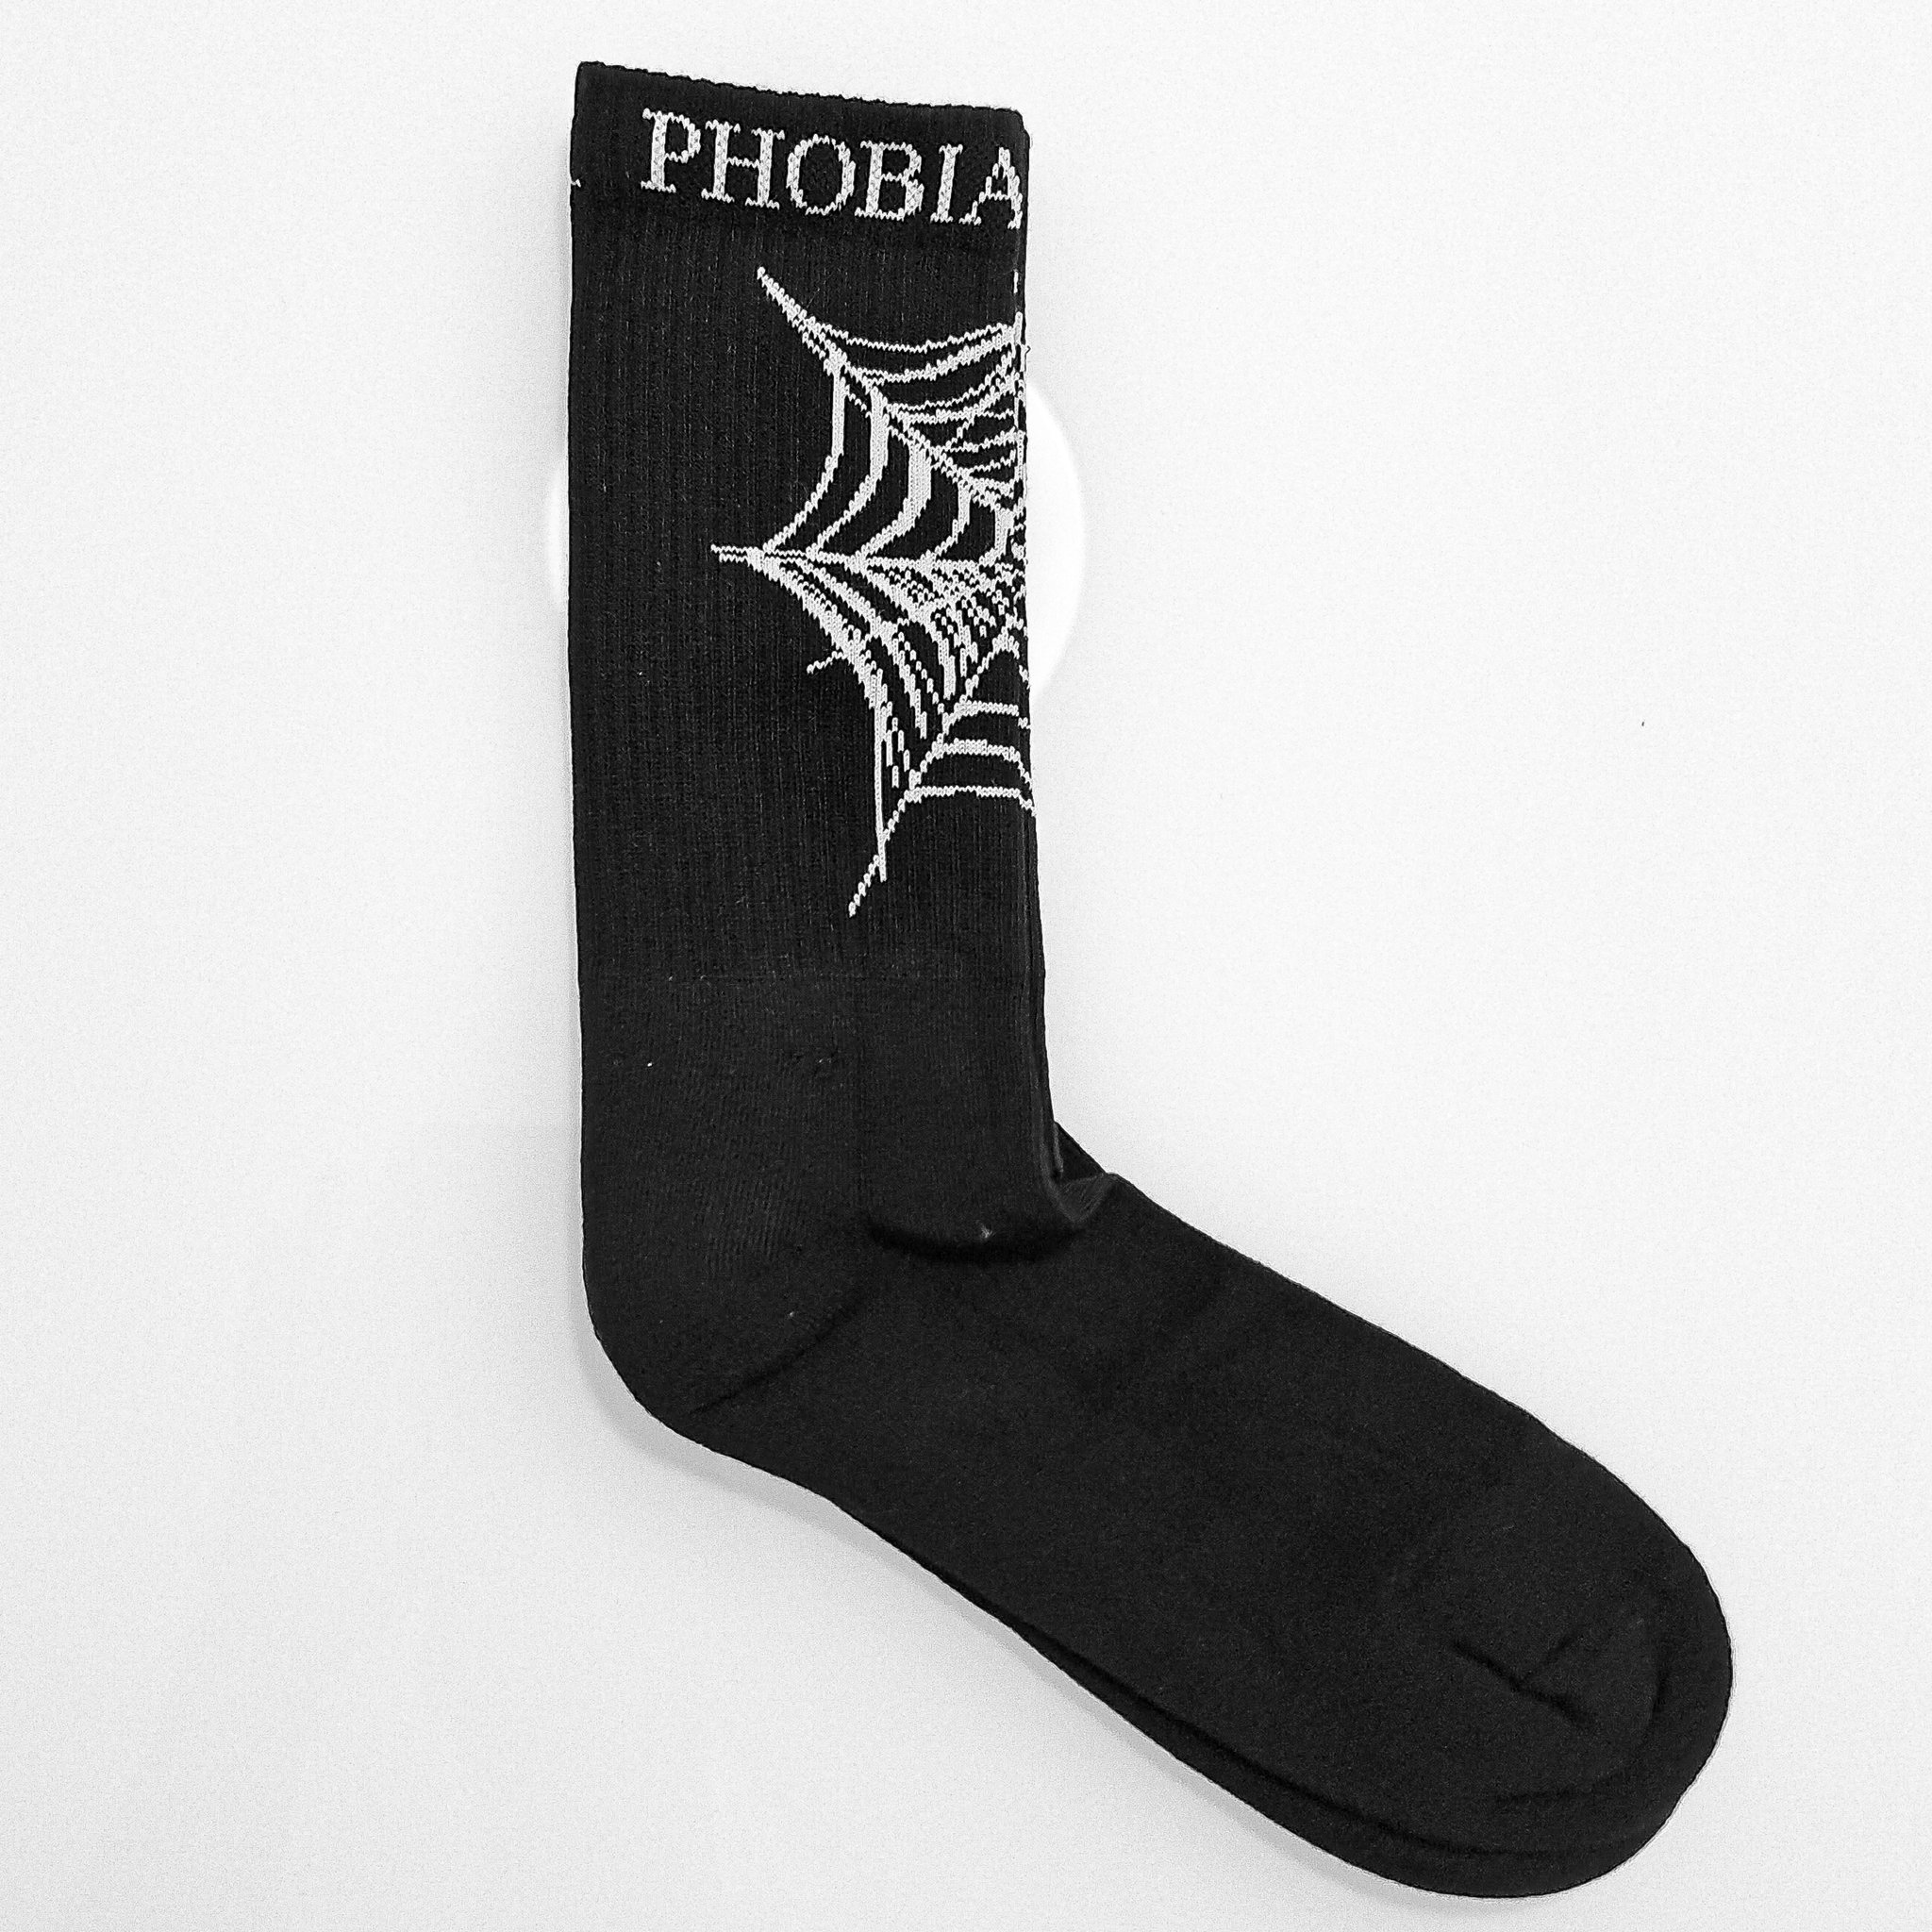 Calze Phobia Ragnatela Black